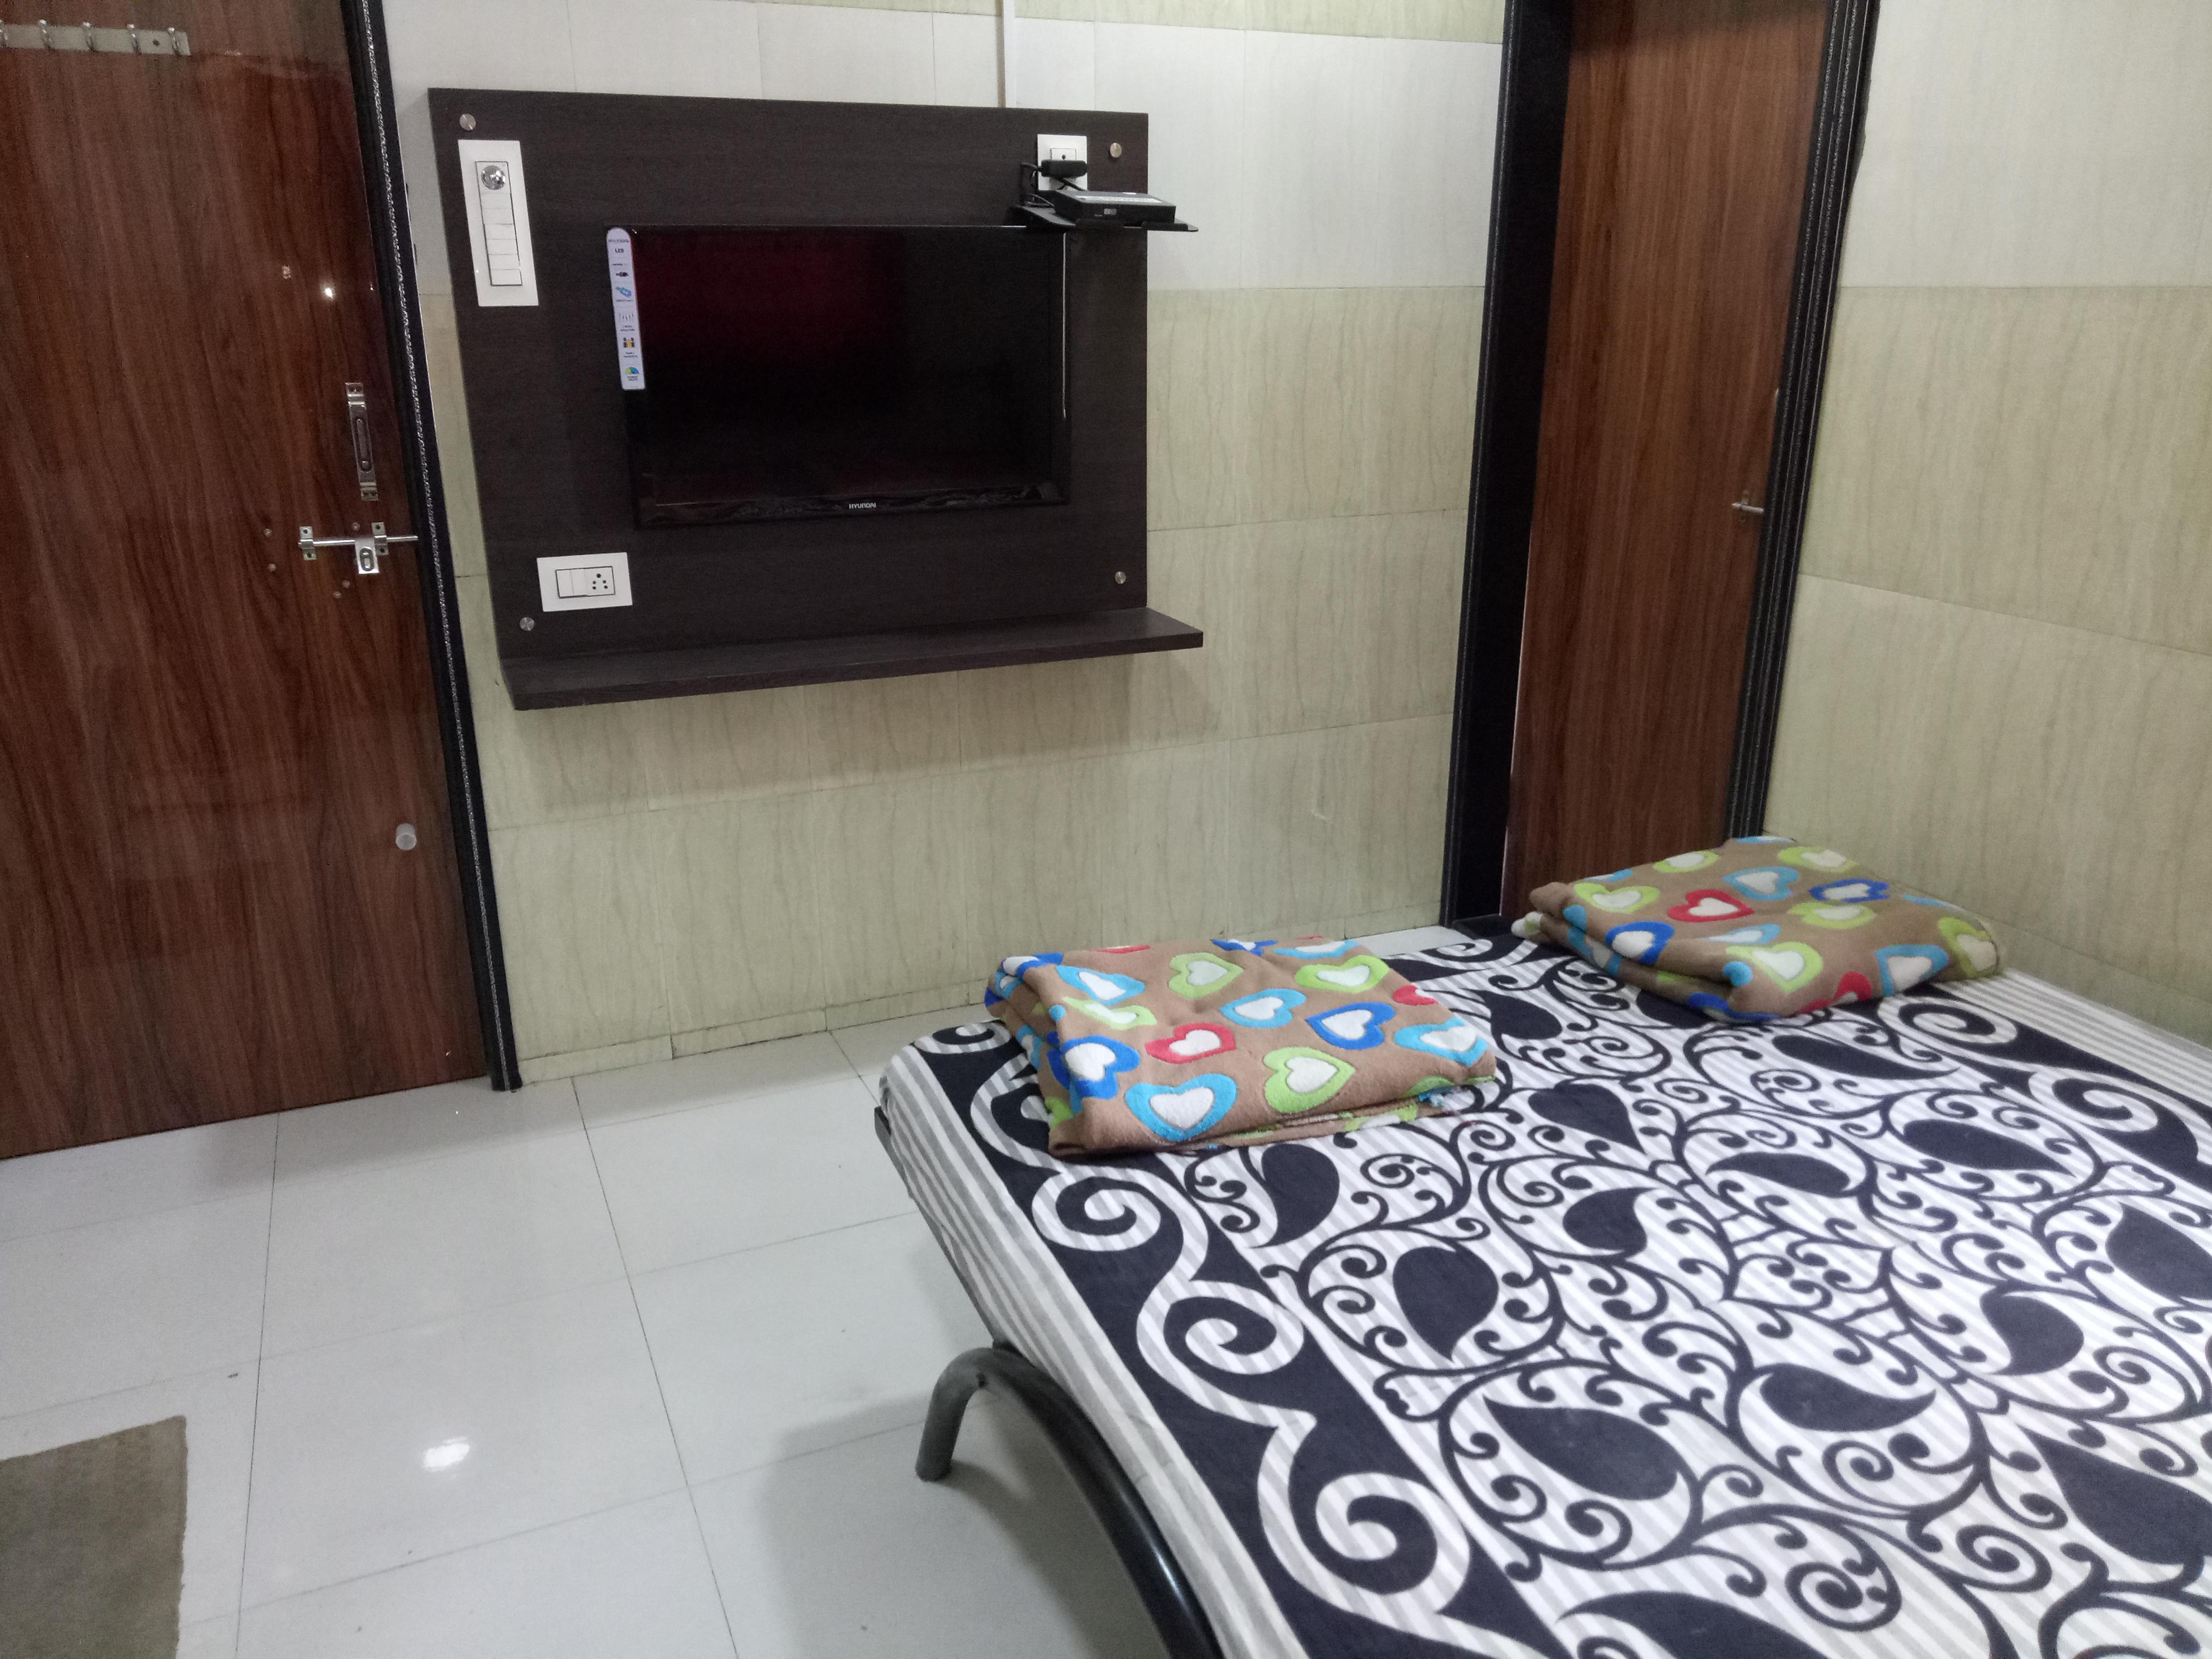 Hotel Tanishq Lodging_image1